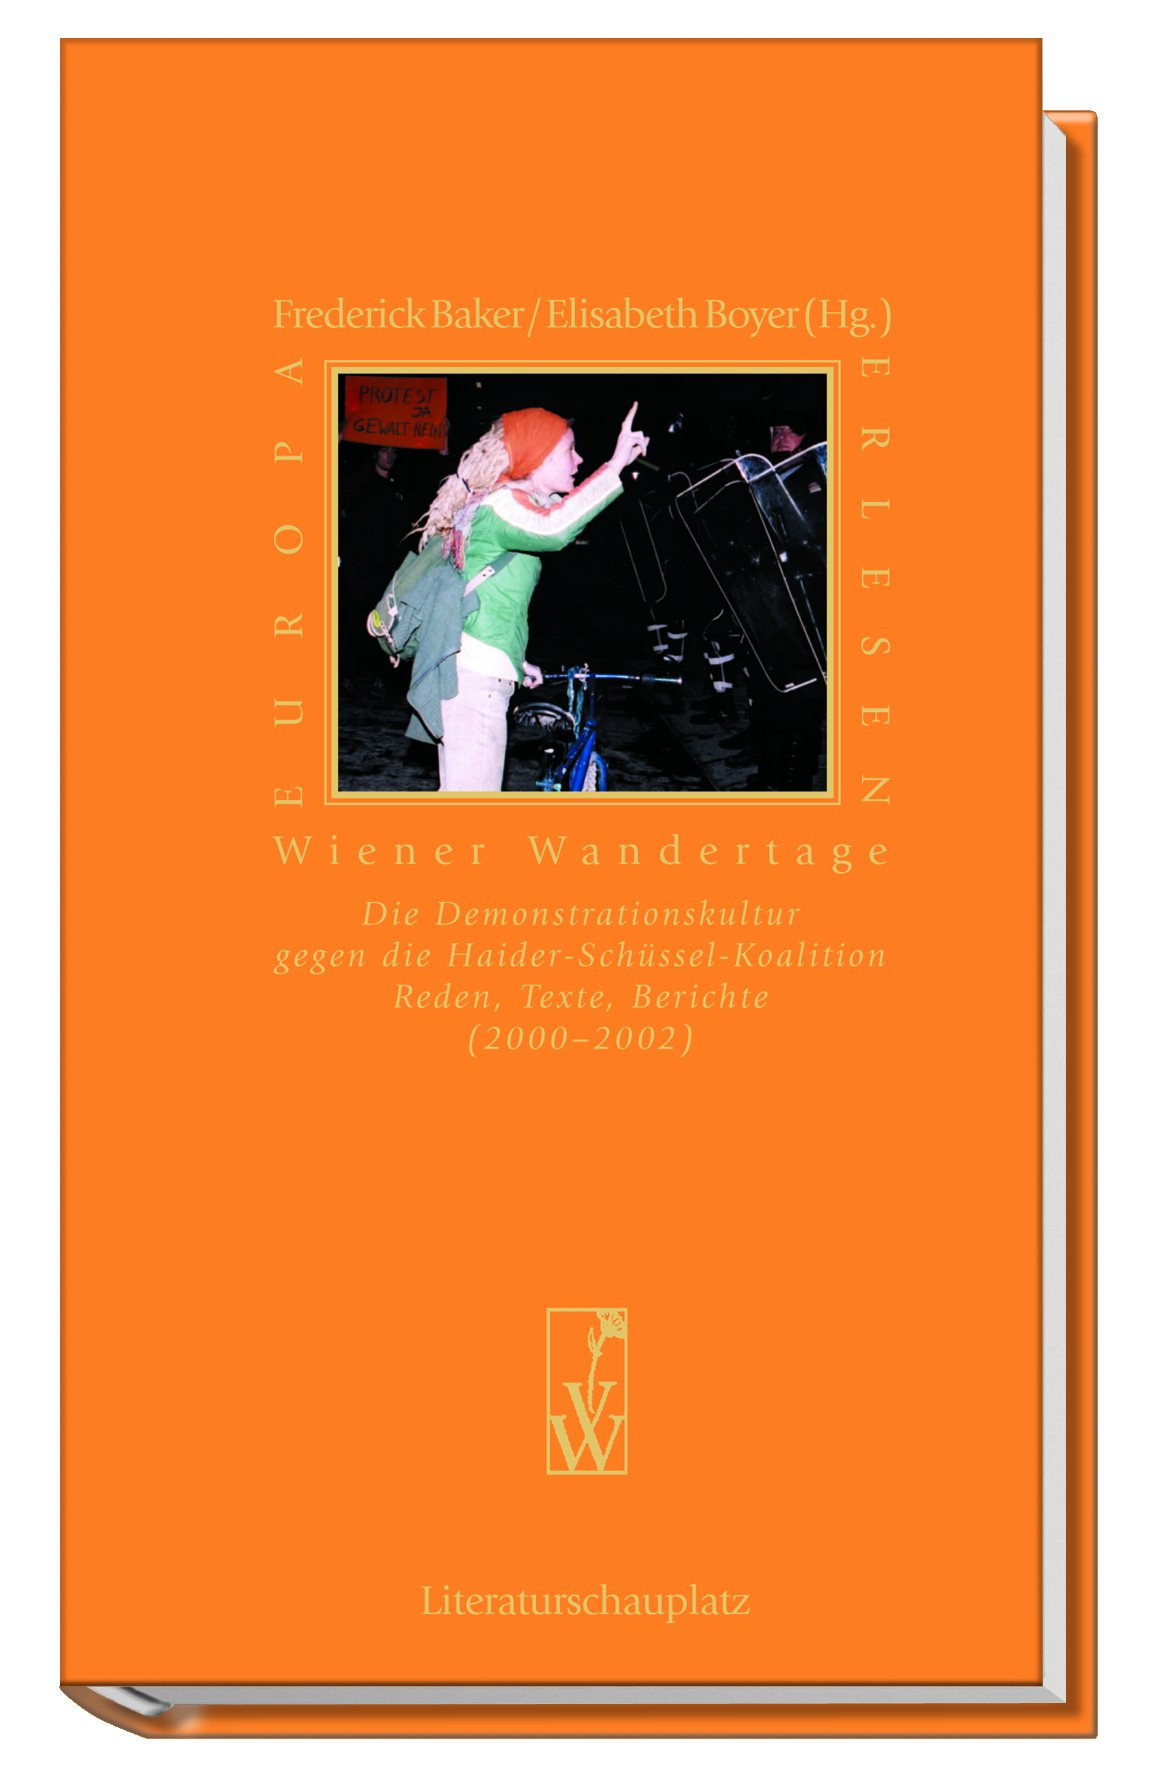 Wiener Wandertage Elisabeth Boyer